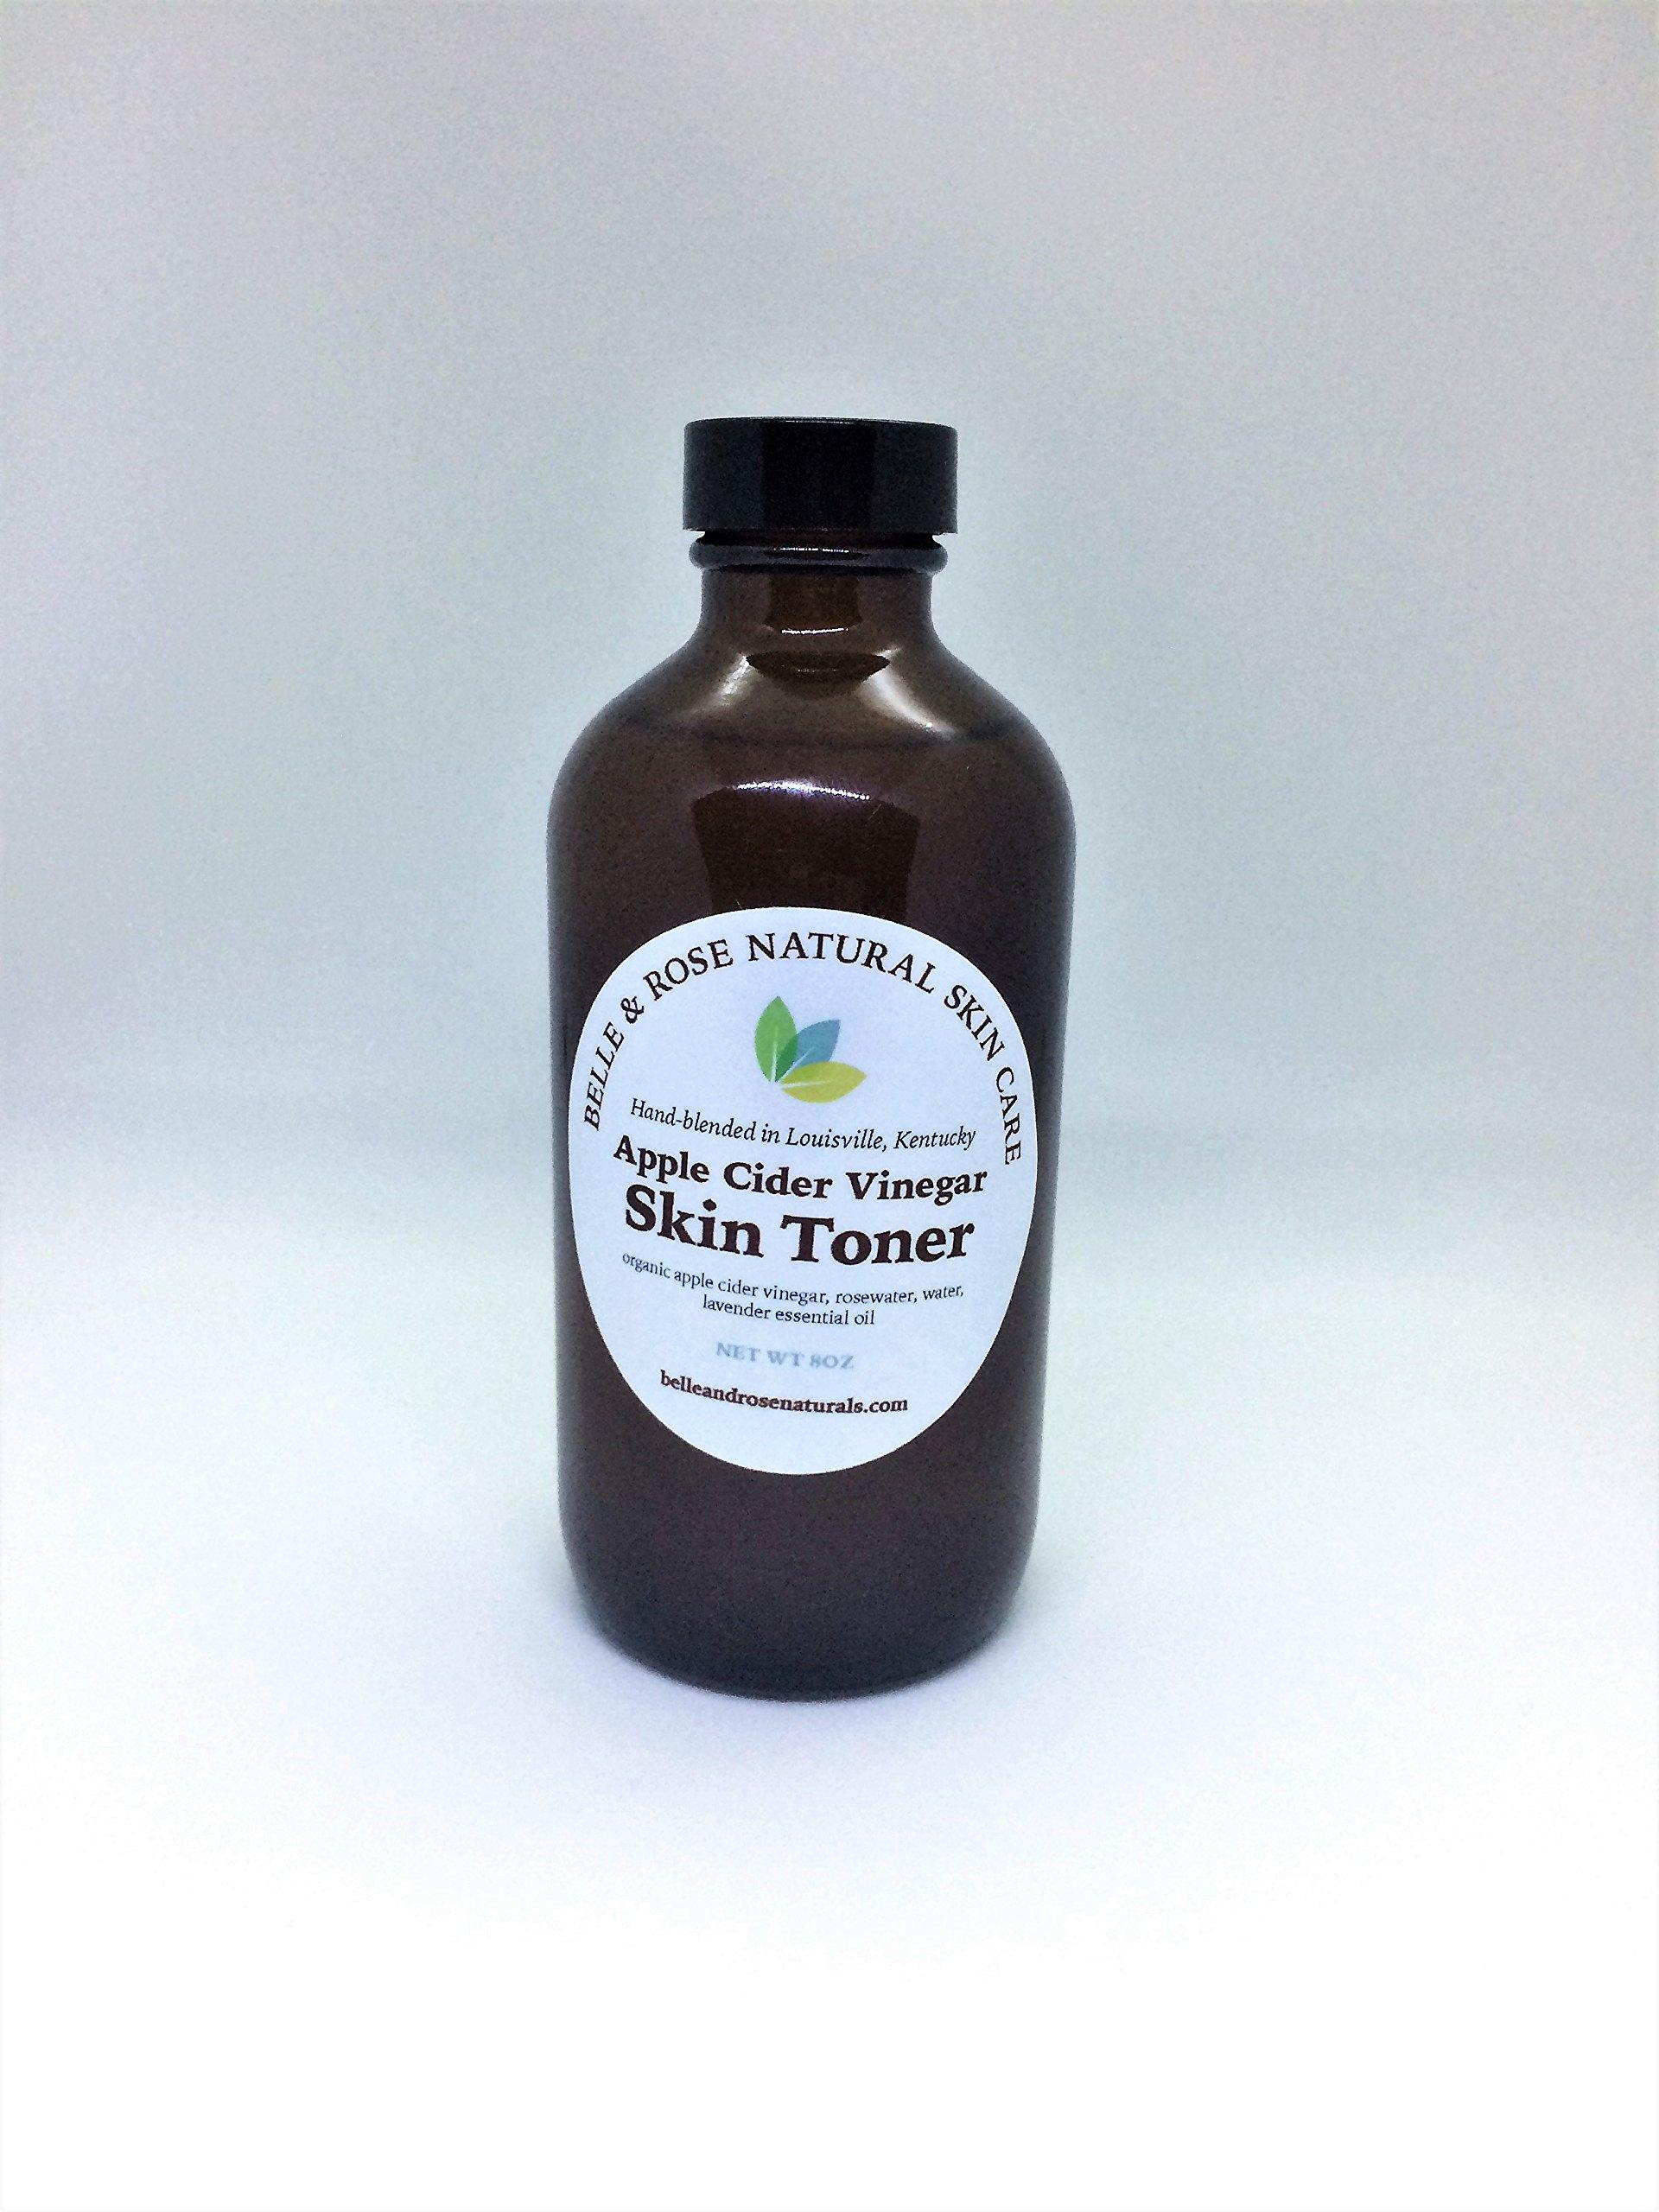 Apple Cider Vinegar Skin Toner